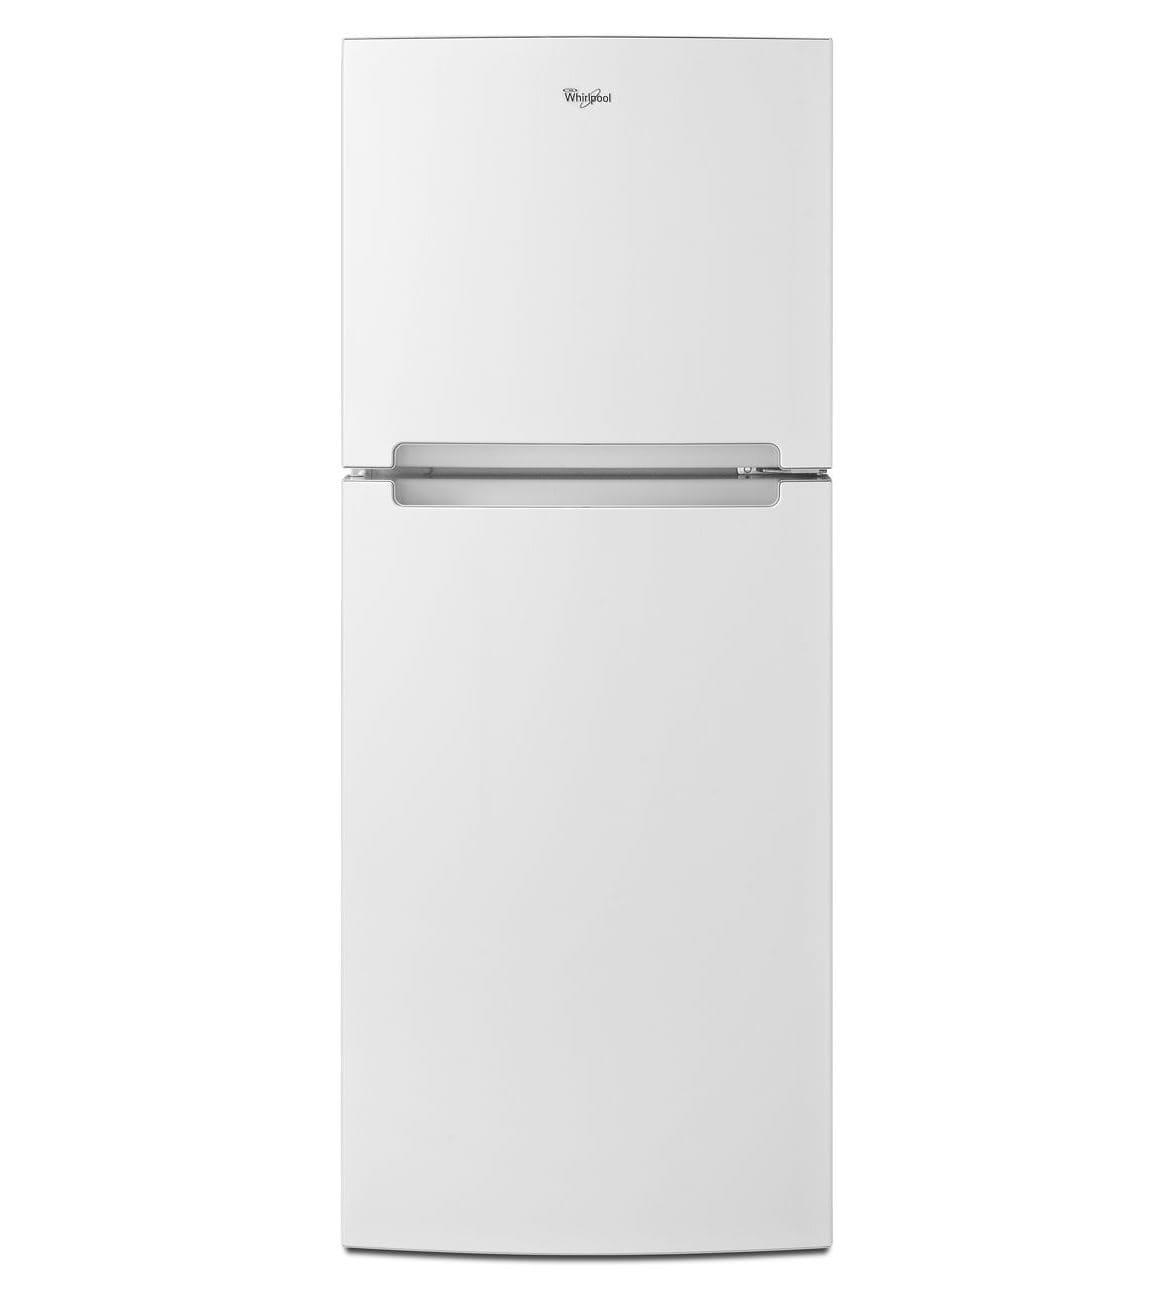 Whirlpool WRT111SFAW Top Freezer Refrigerator